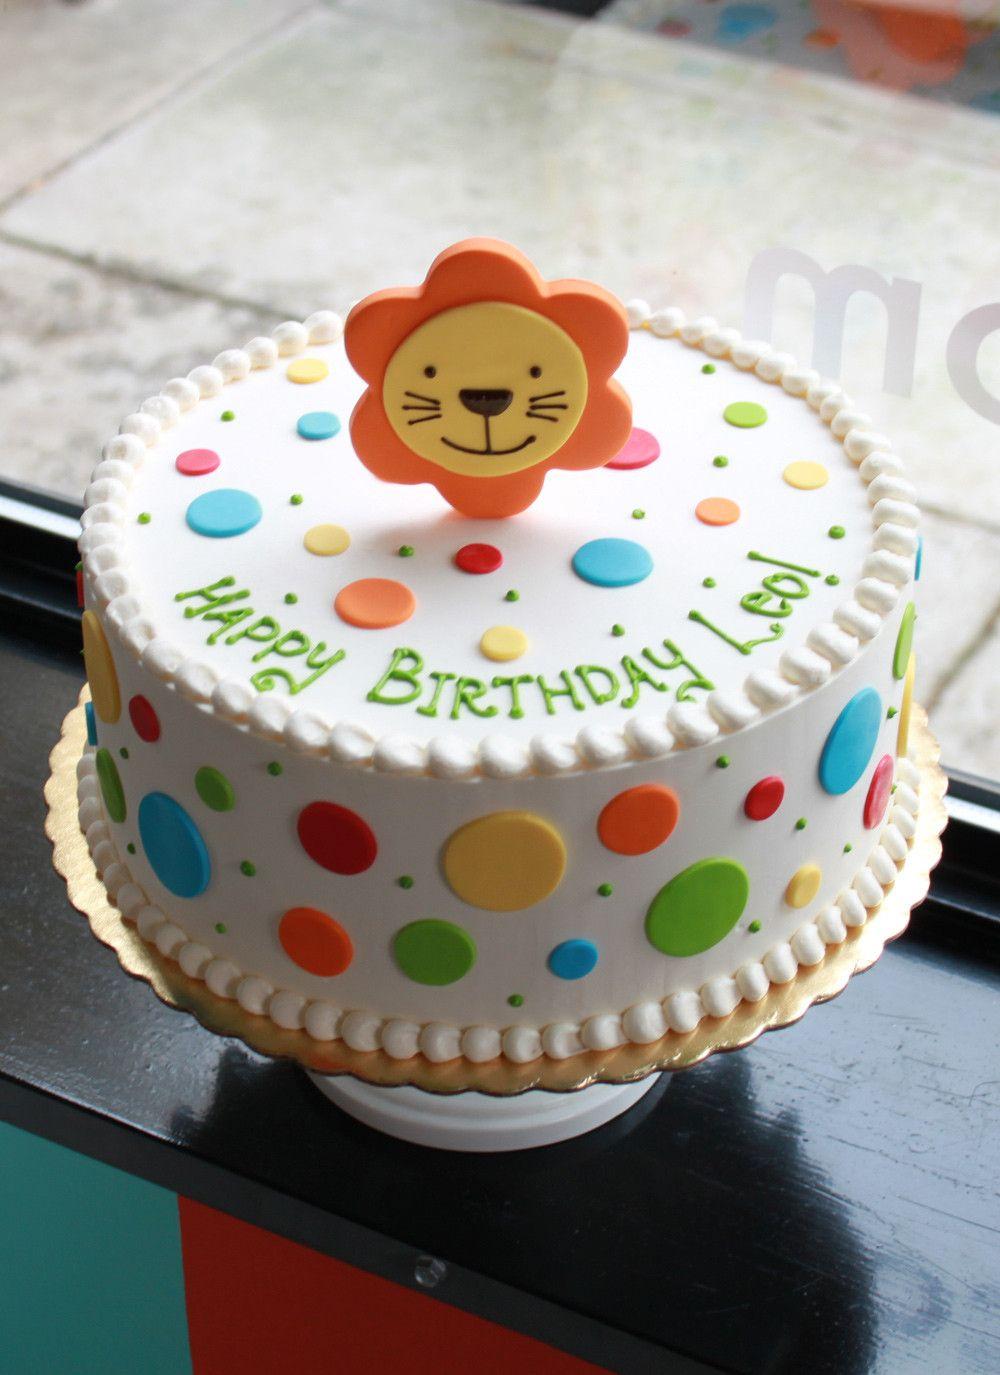 Enjoyable Food Lion Birthday Cakes Awesome 89 Food Lion Birthday Cake Ice Funny Birthday Cards Online Hetedamsfinfo